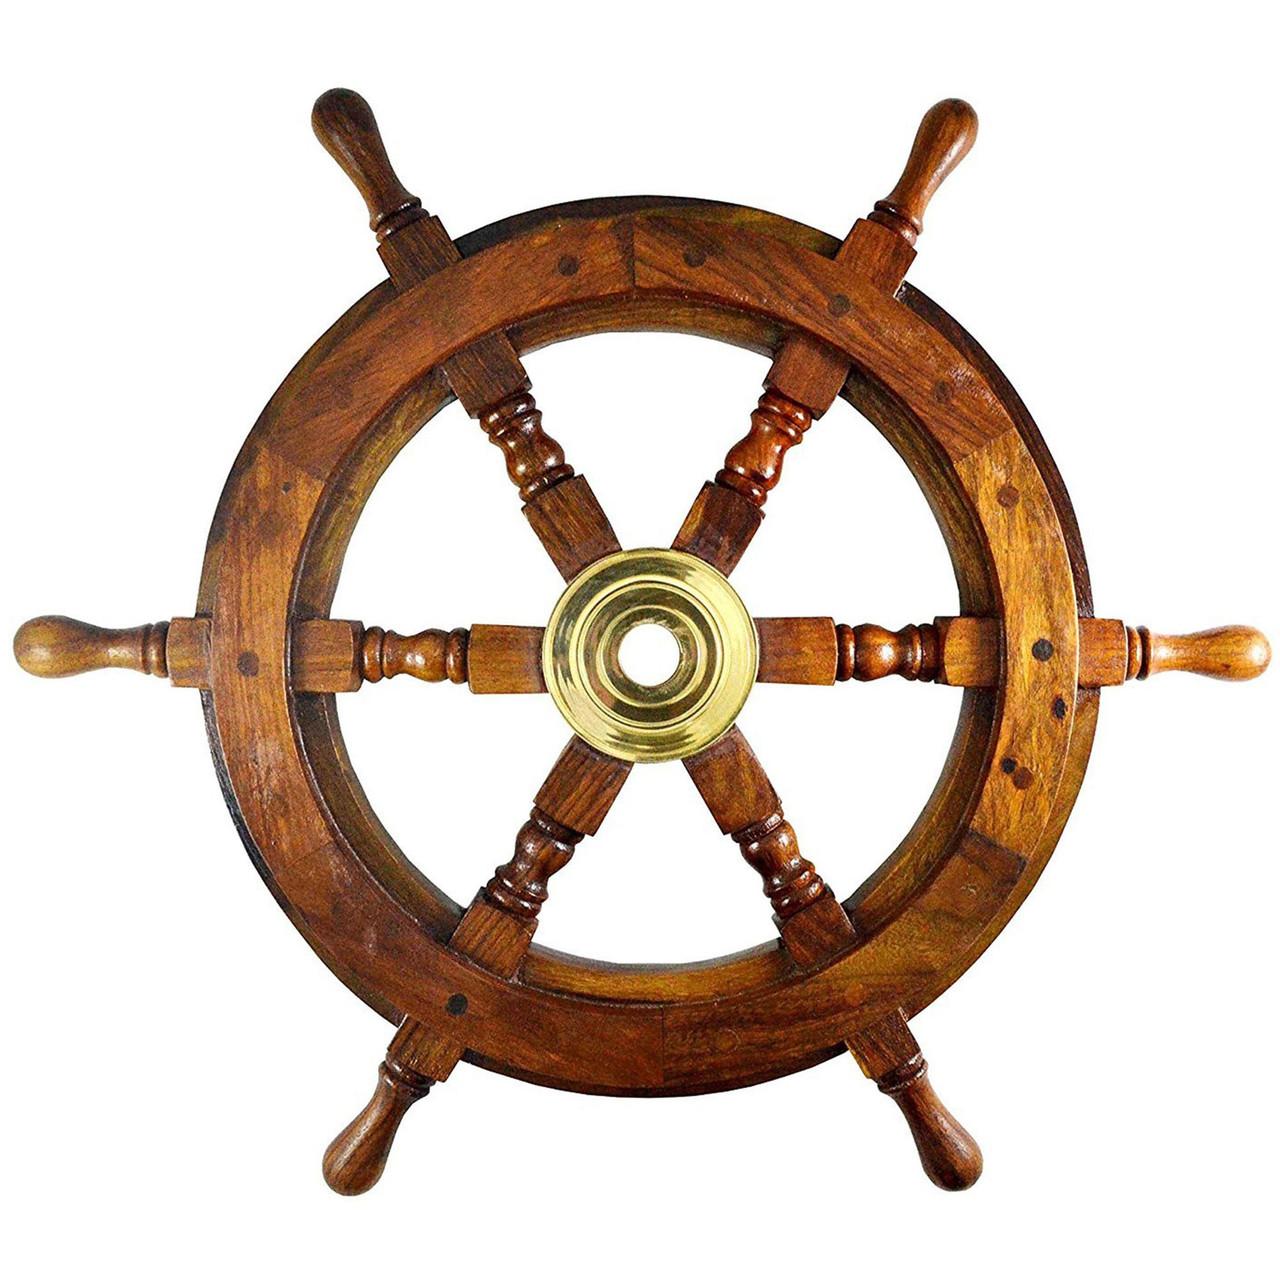 Teak Ships Steering Wheel Brass Hub Pirate Wall Decor